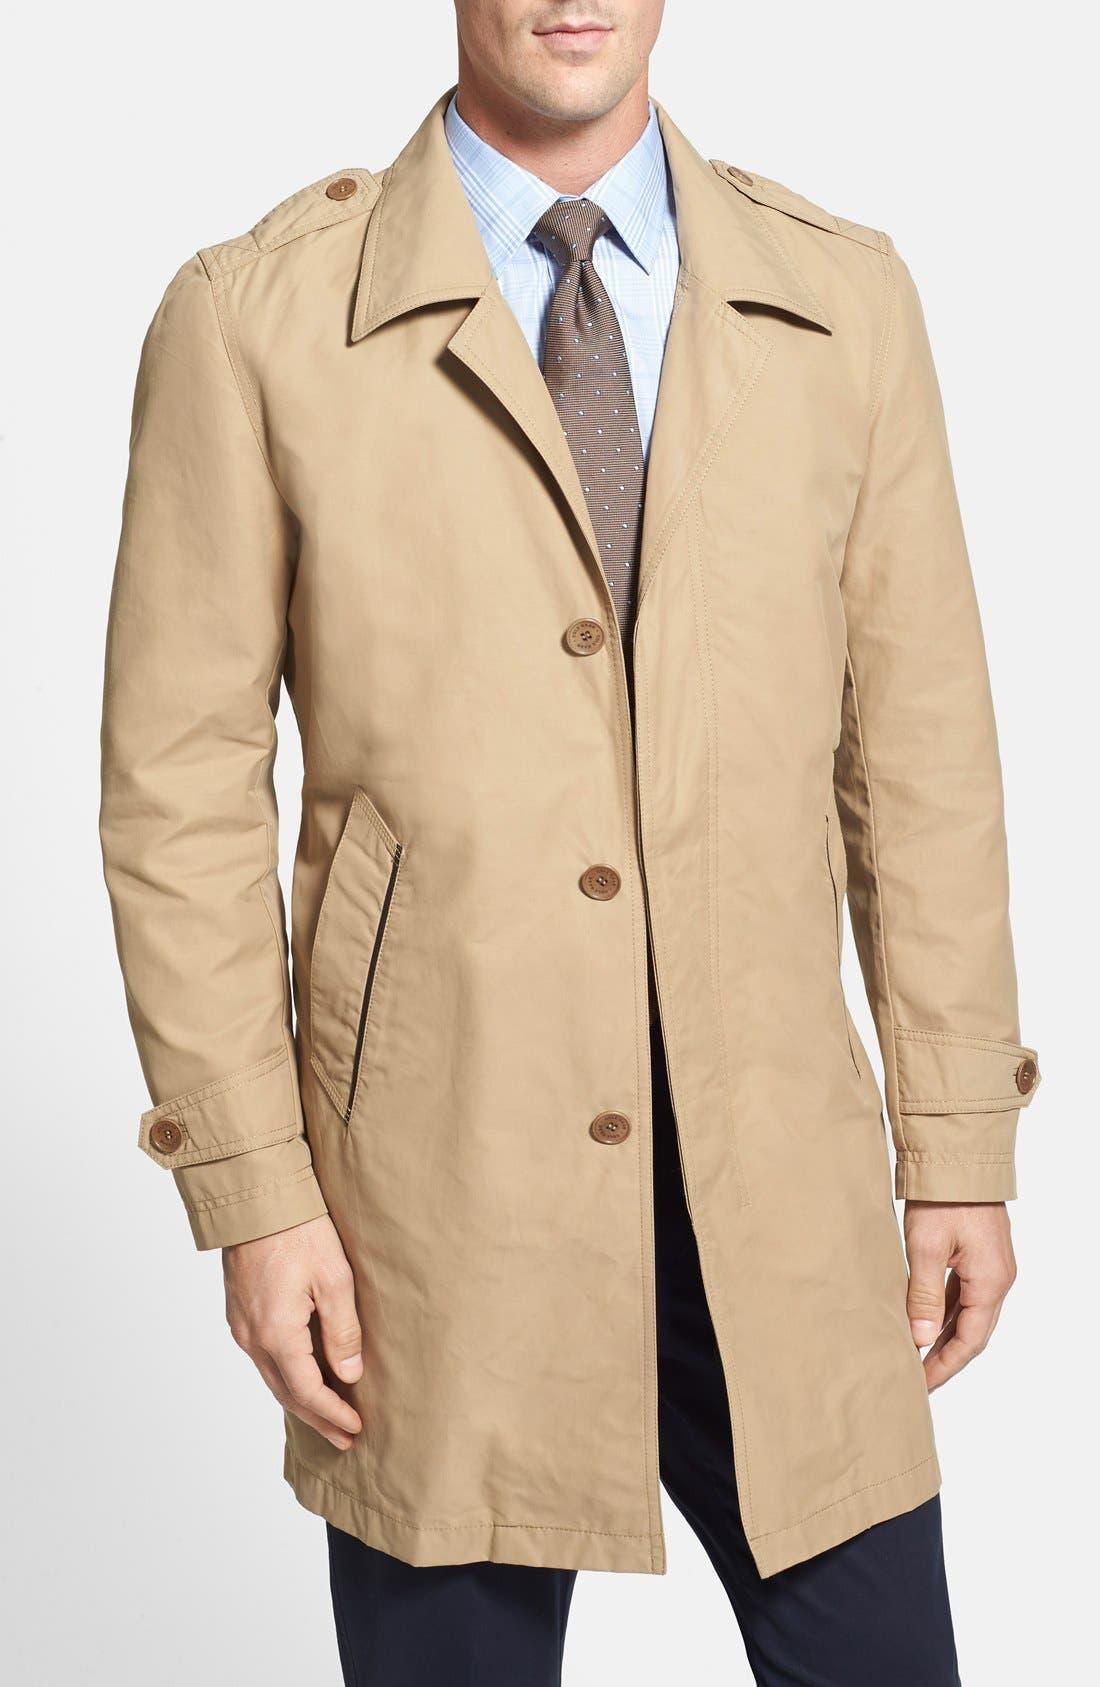 COLE HAAN Cotton Blend Twill Car Coat, Main, color, 258